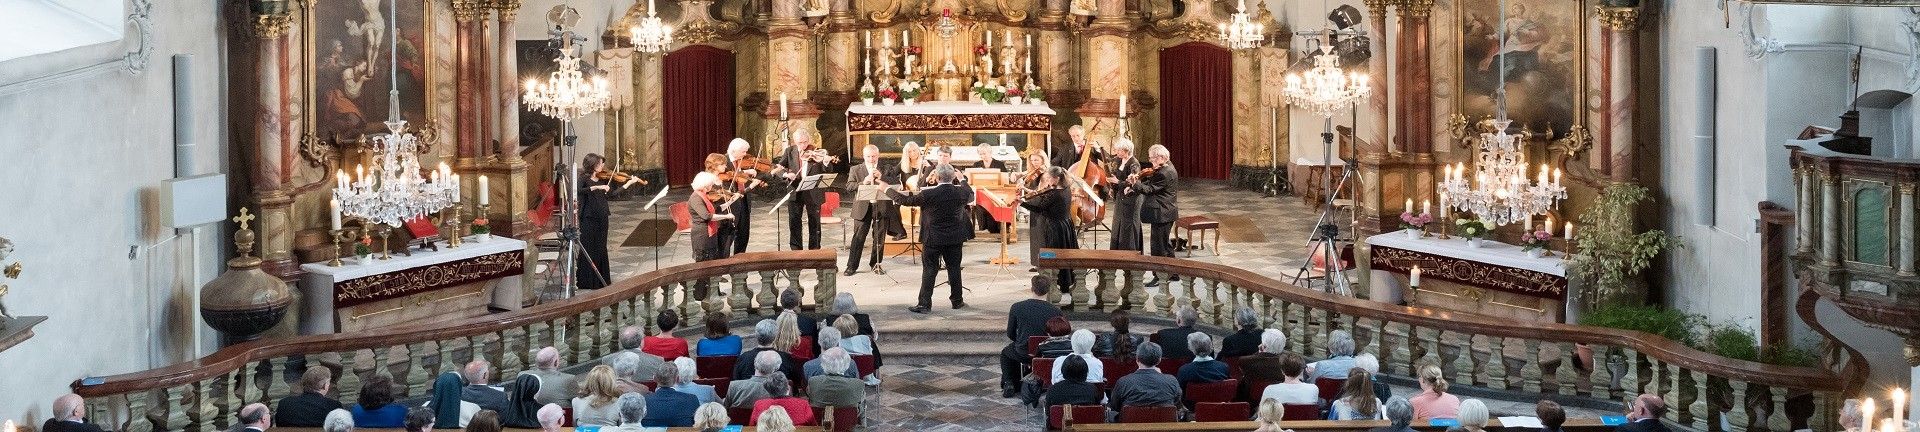 Main-Taunus-Kreis - Gallus-Konzert in Flörsheim am Main